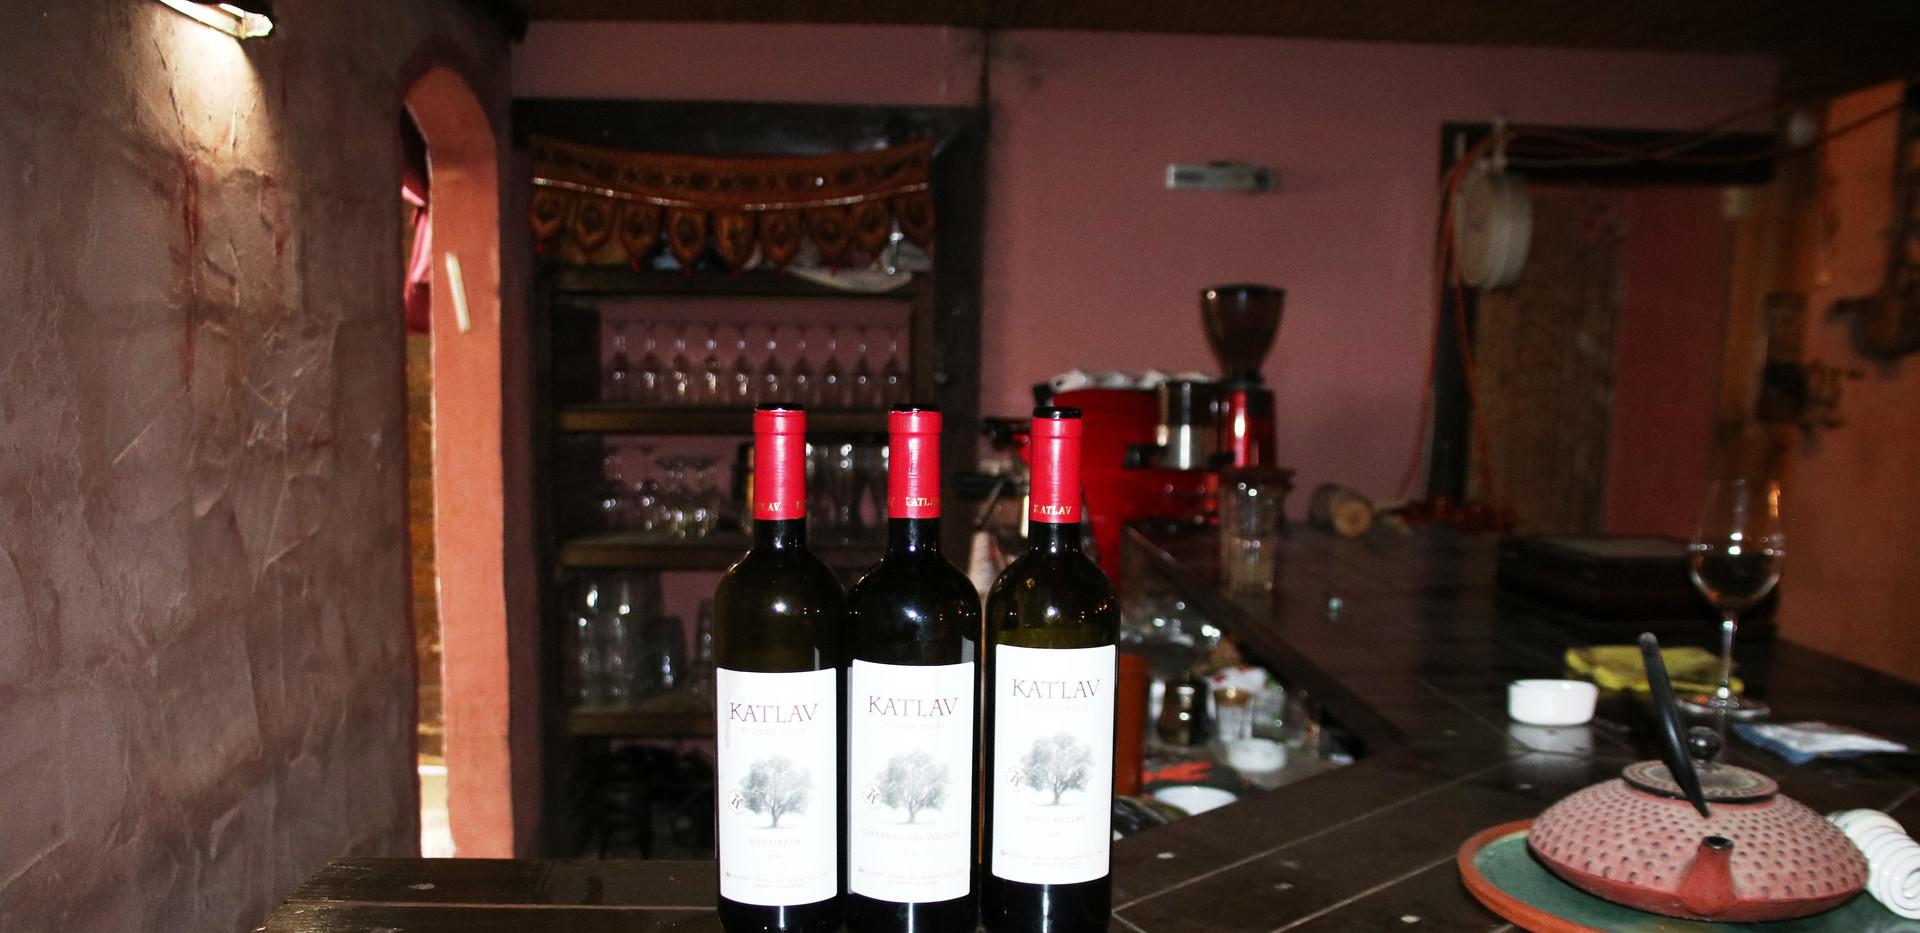 Katlav wines